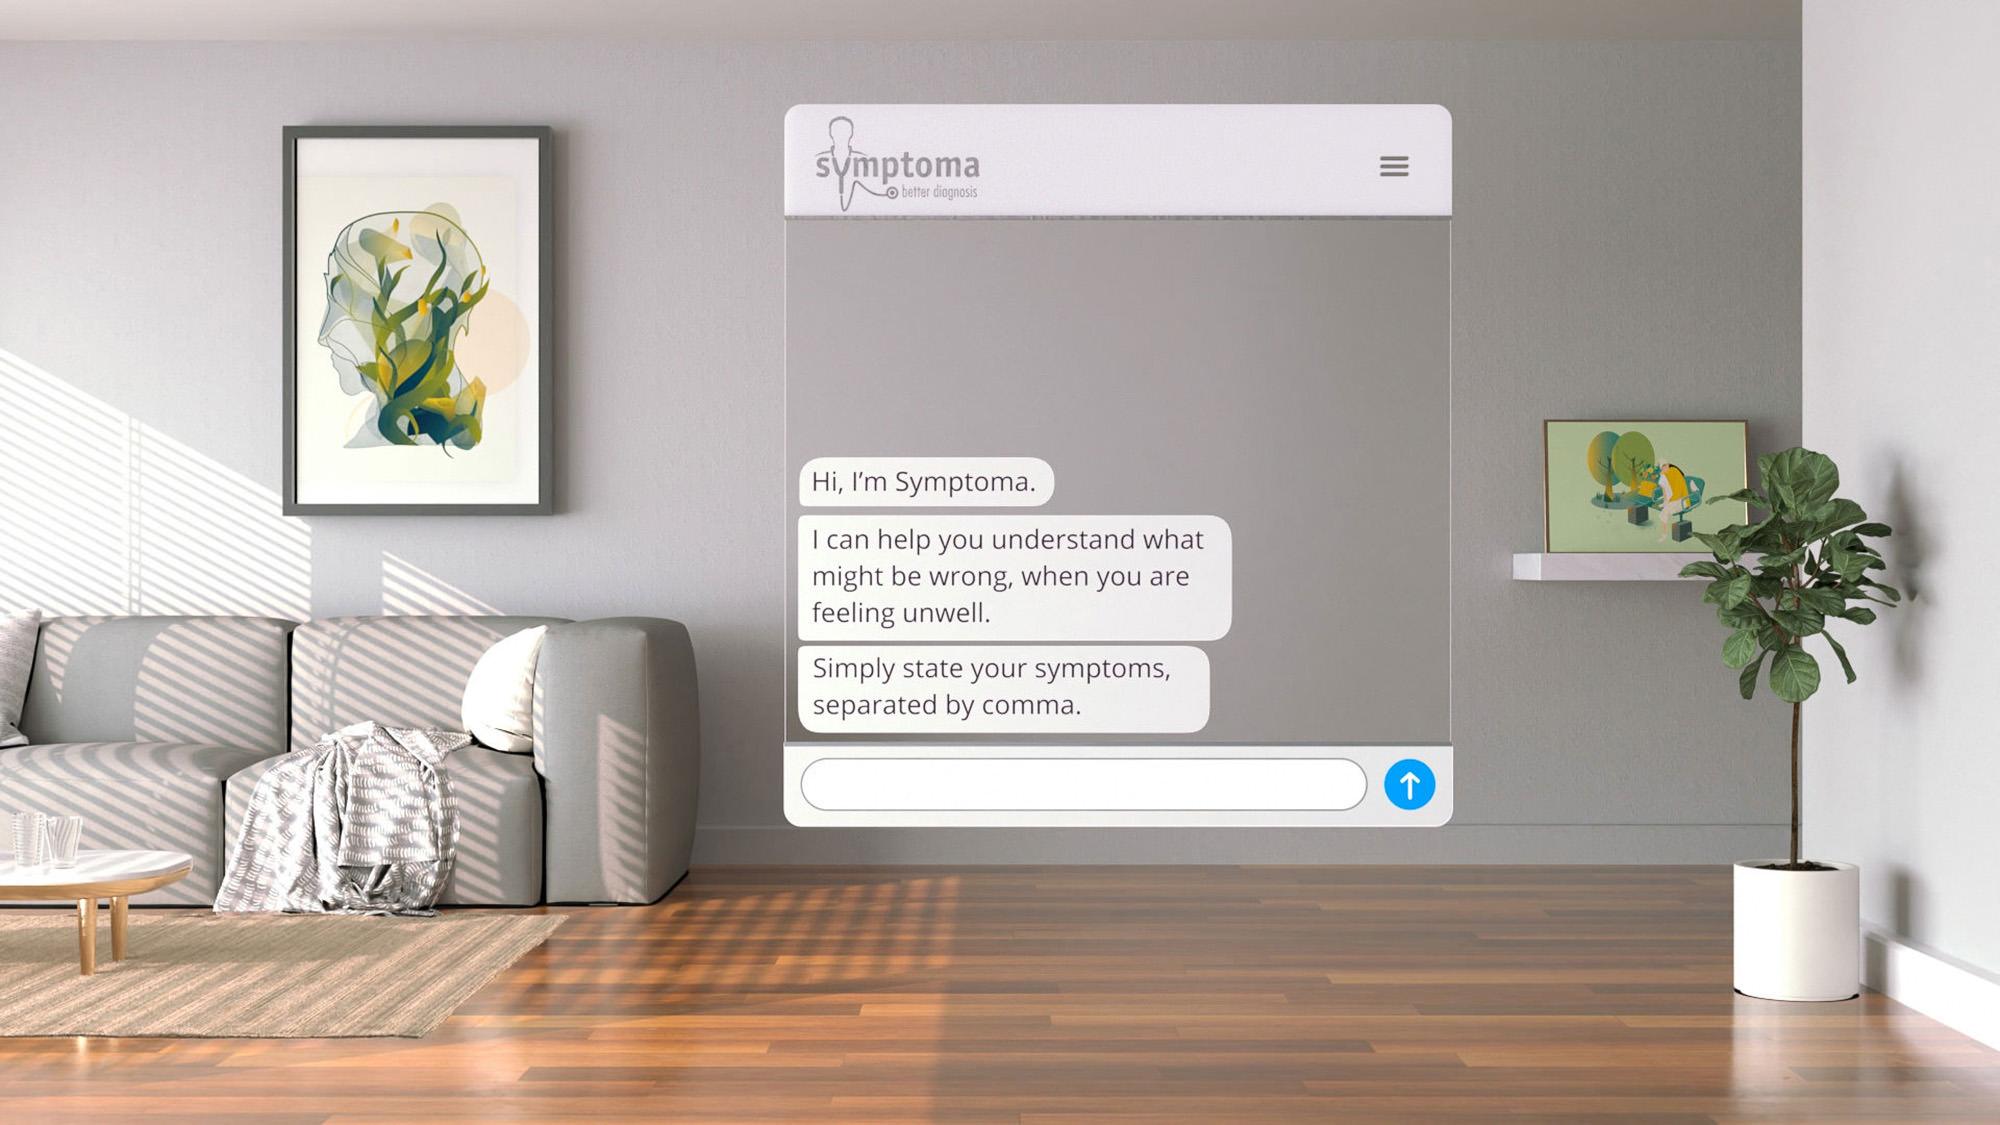 Symptoma-UI-Design-Personal-Healthcare-AI-Konvergenz-Studio